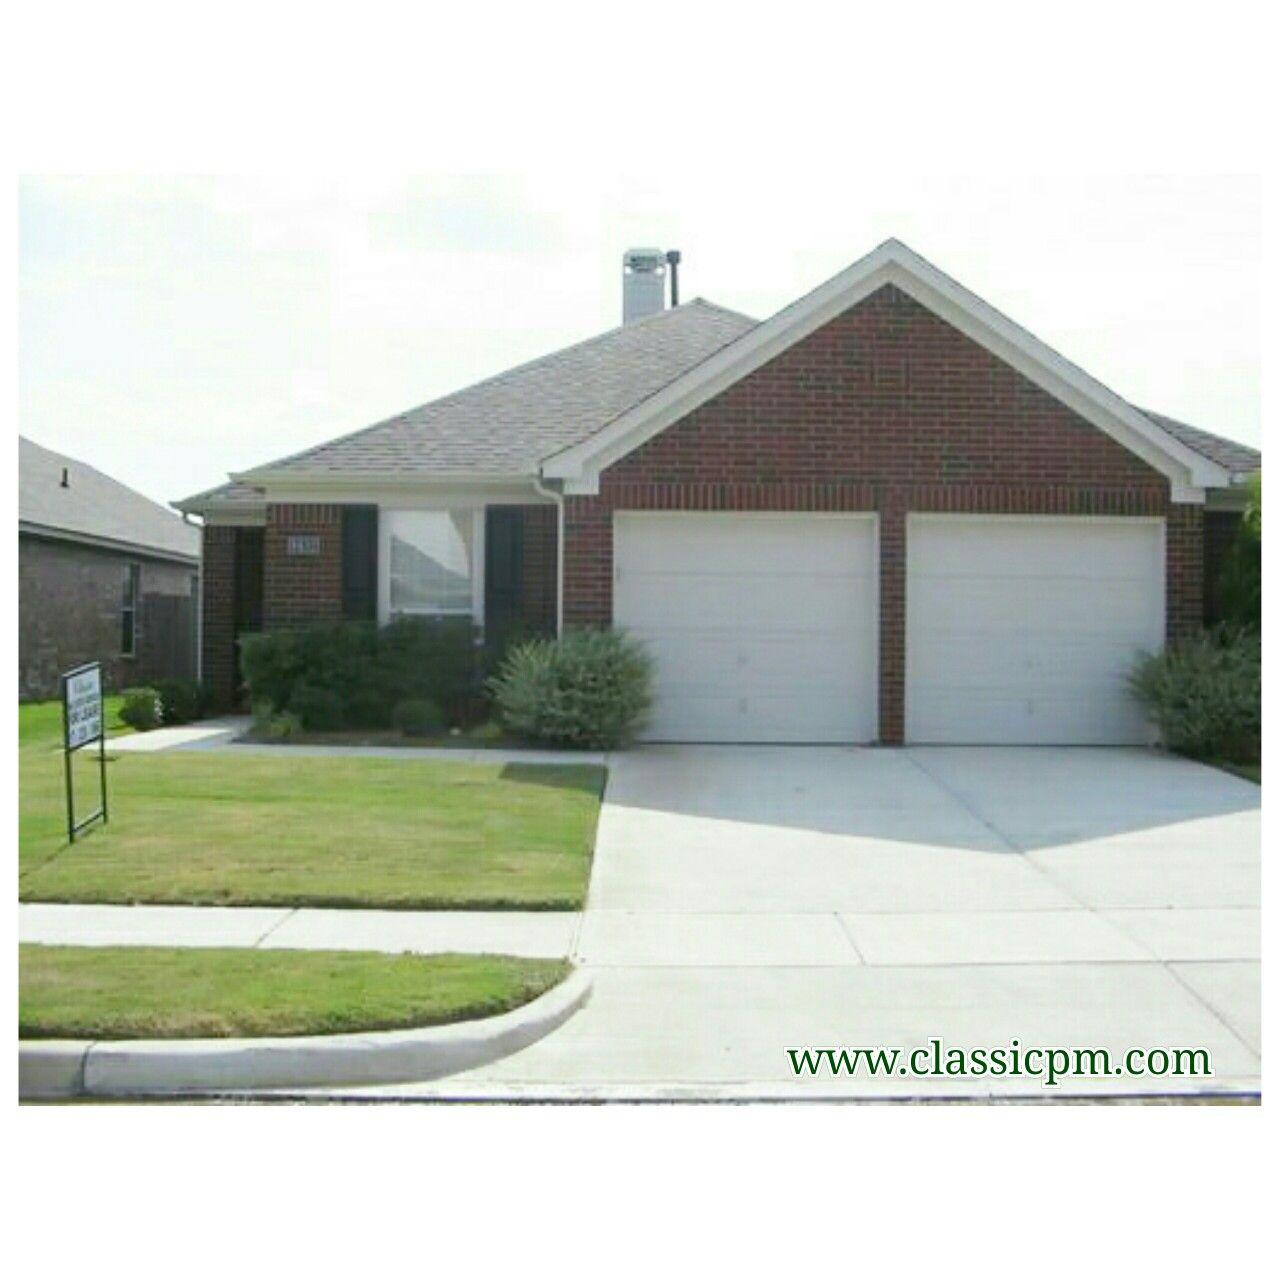 8632 Fernhill Drive Fort Worth Texas 76123 3 Bd 2 Ba 1 445 Sq